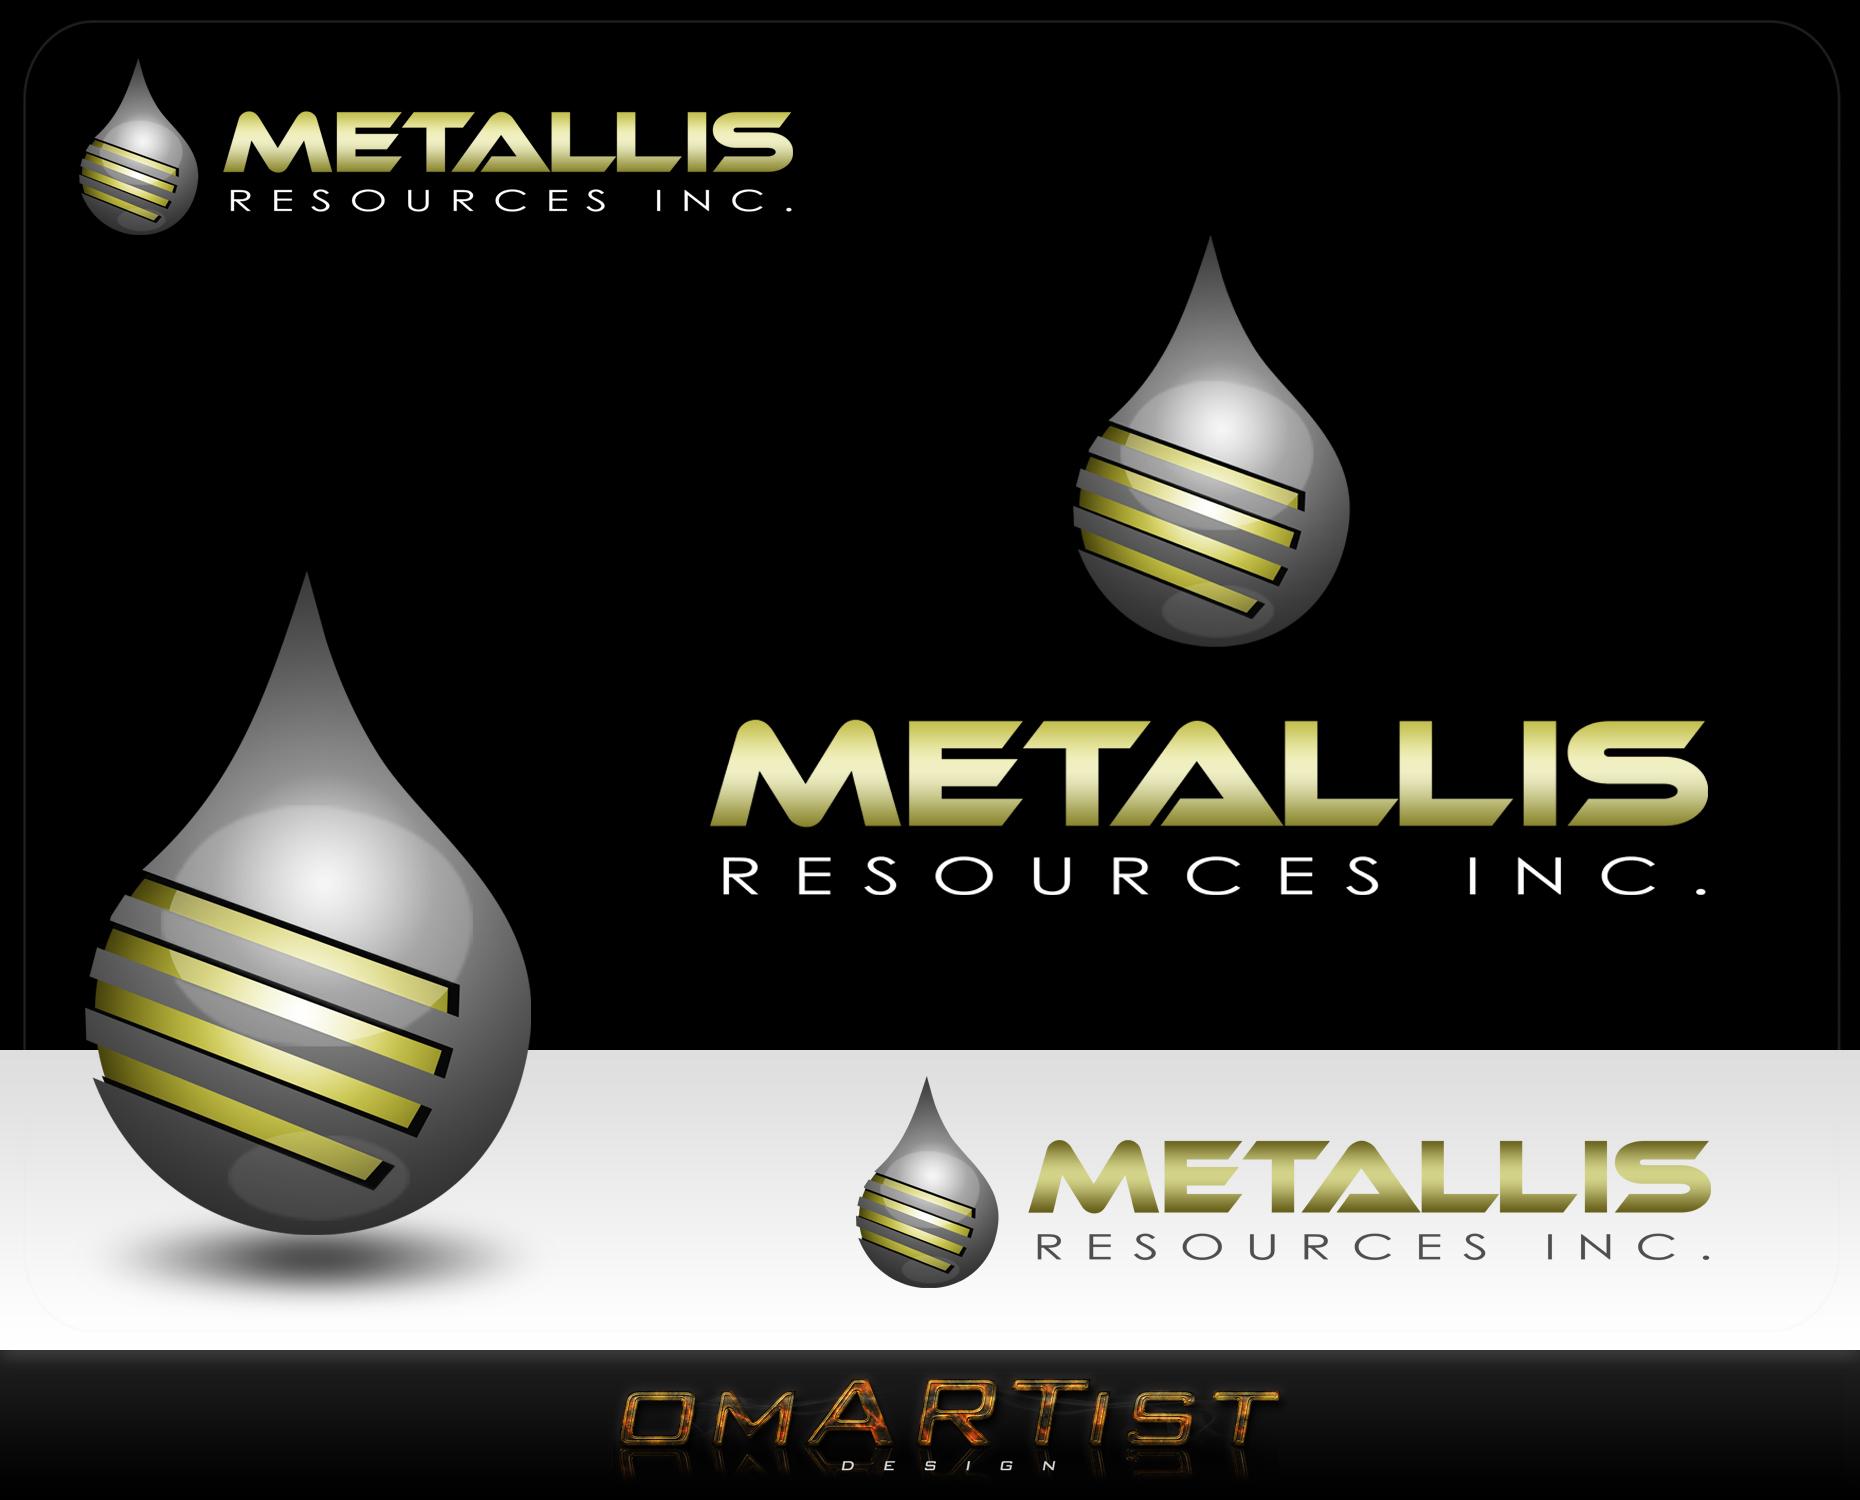 Logo Design by omARTist - Entry No. 161 in the Logo Design Contest Metallis Resources Inc Logo Design.